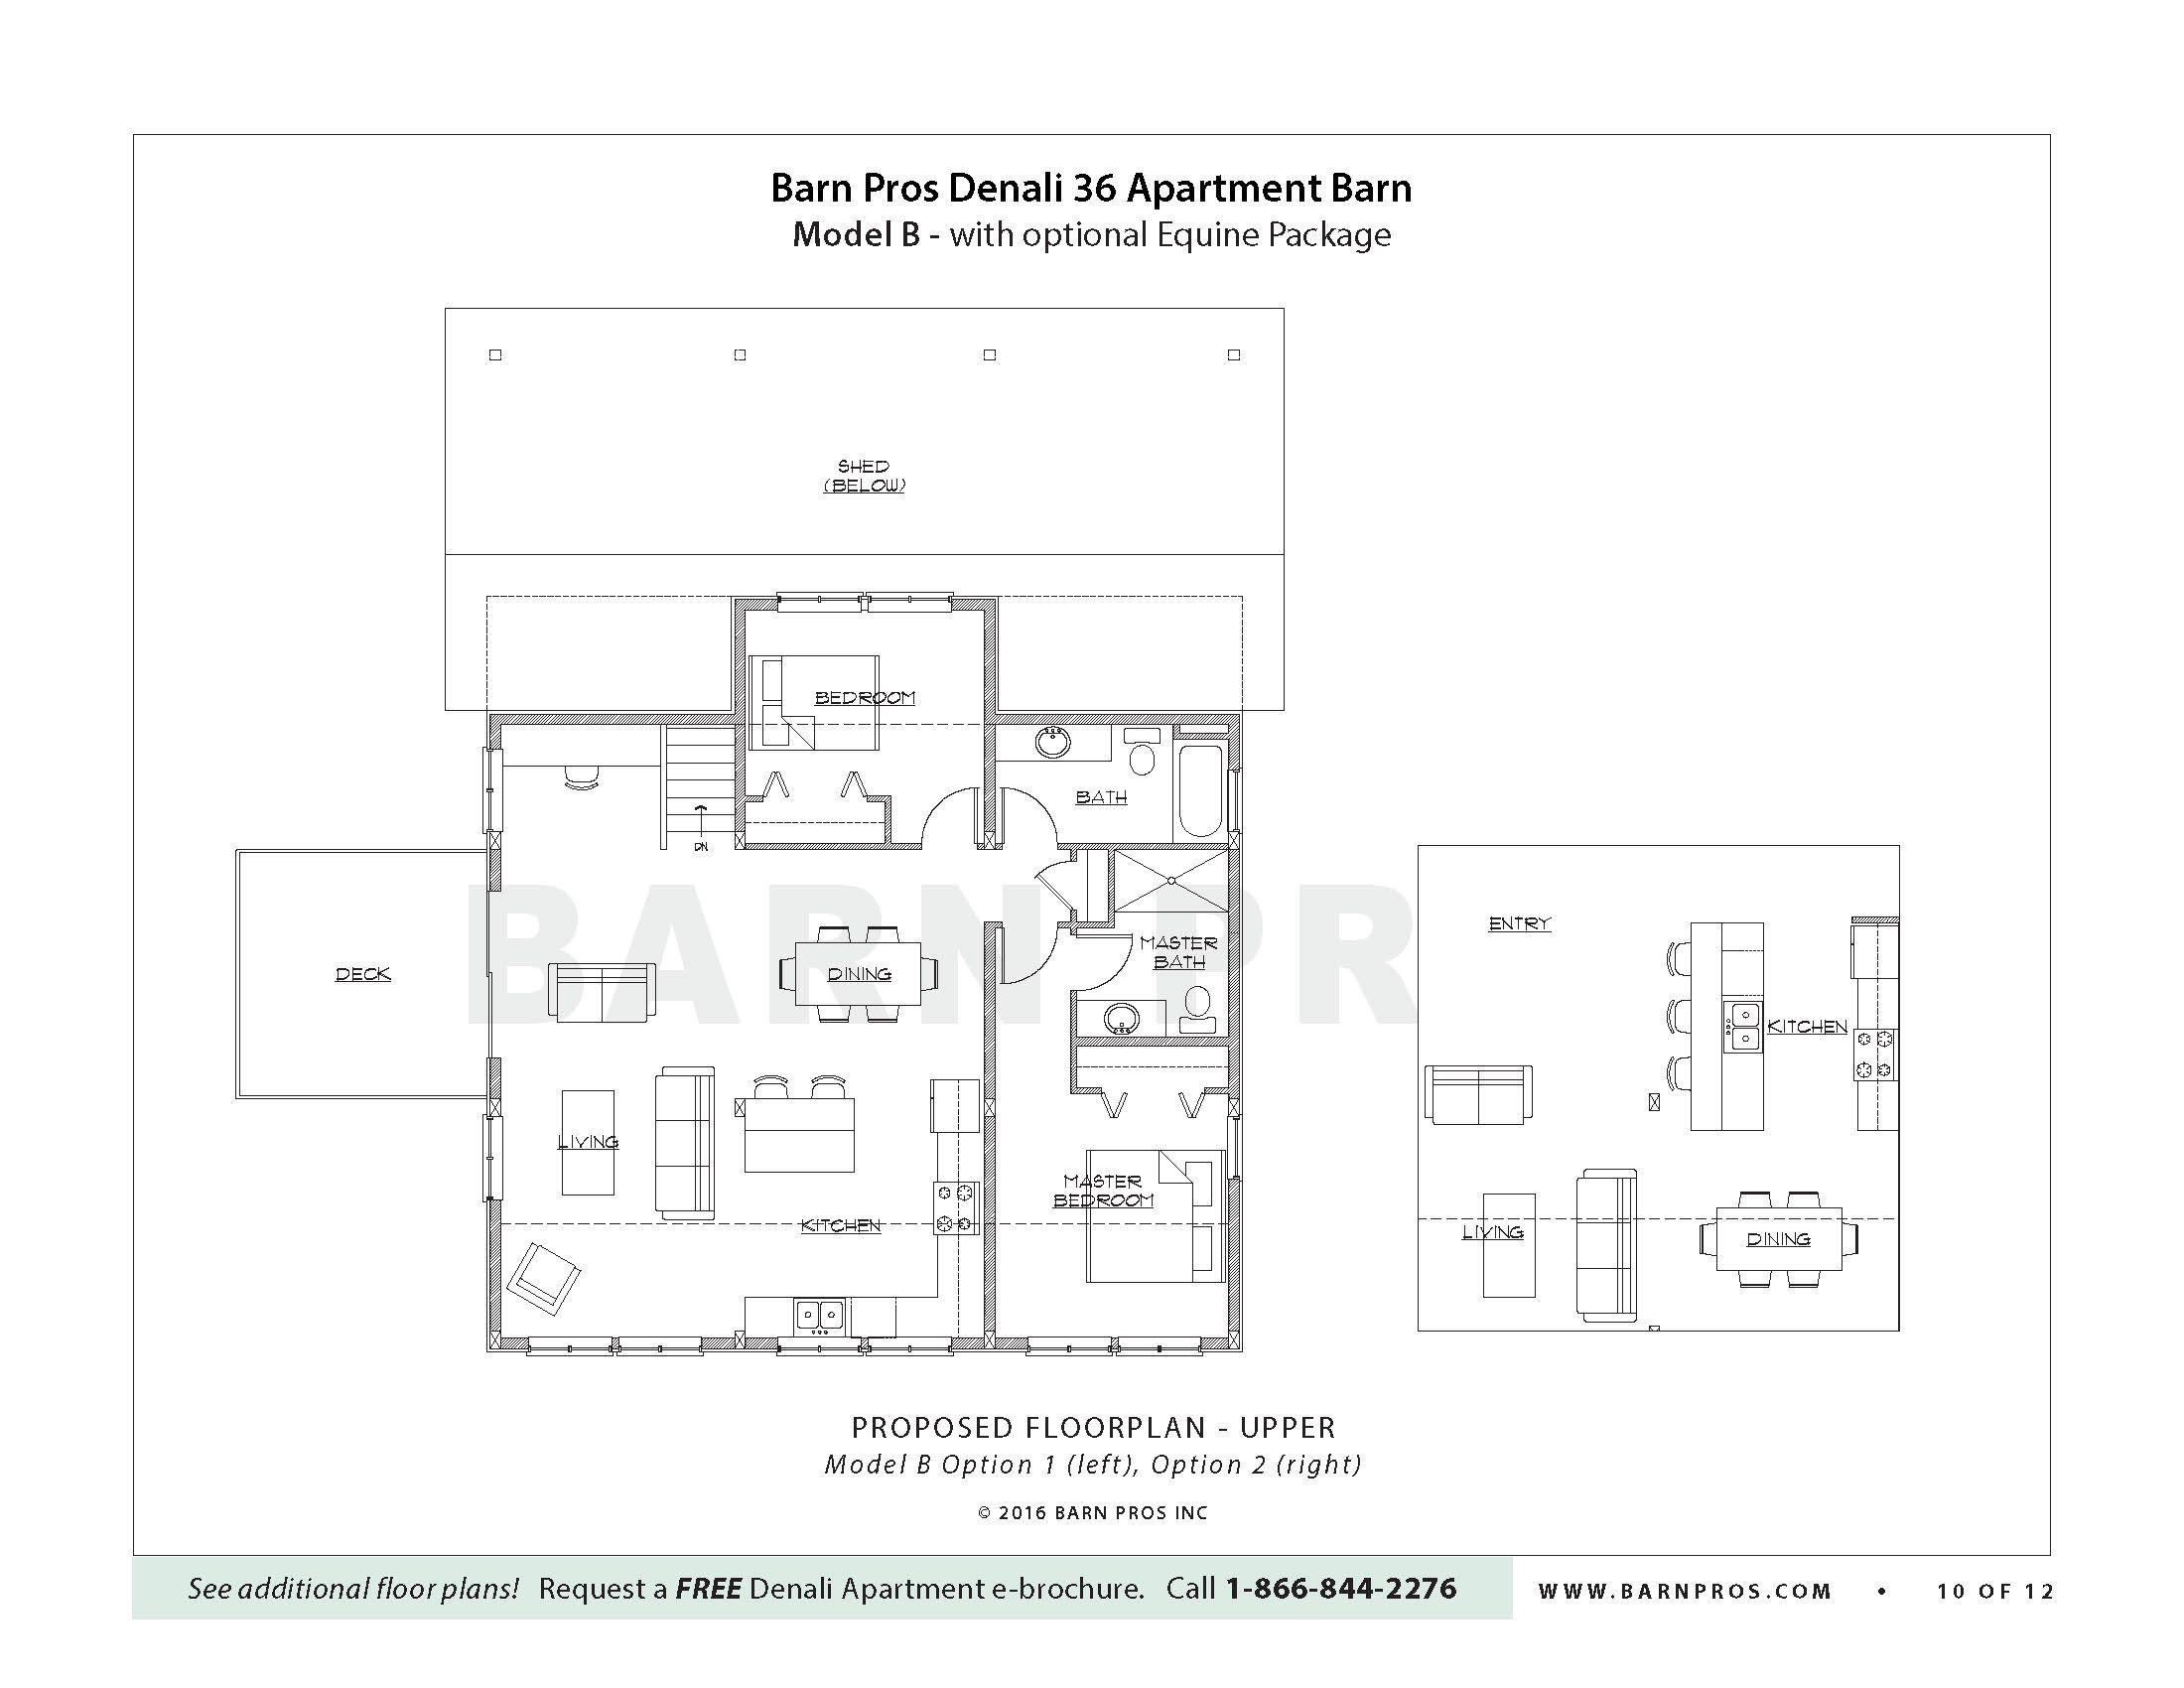 Apartment Barn Barn With Loft The Denali Barn Apt Barn Pros